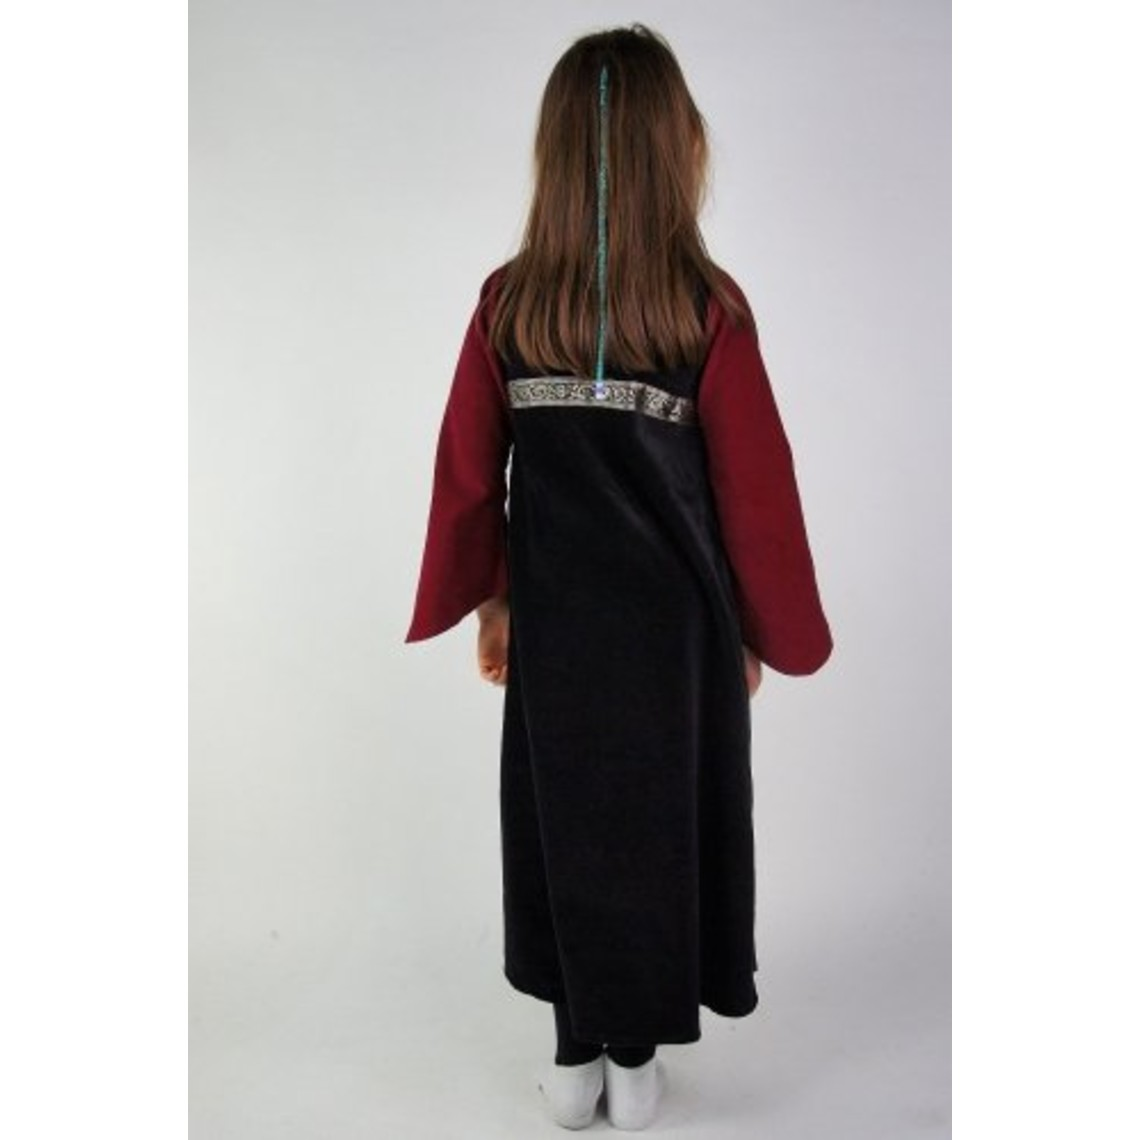 Leonardo Carbone Vestido de chica de terciopelo Ariane, negro-rojo